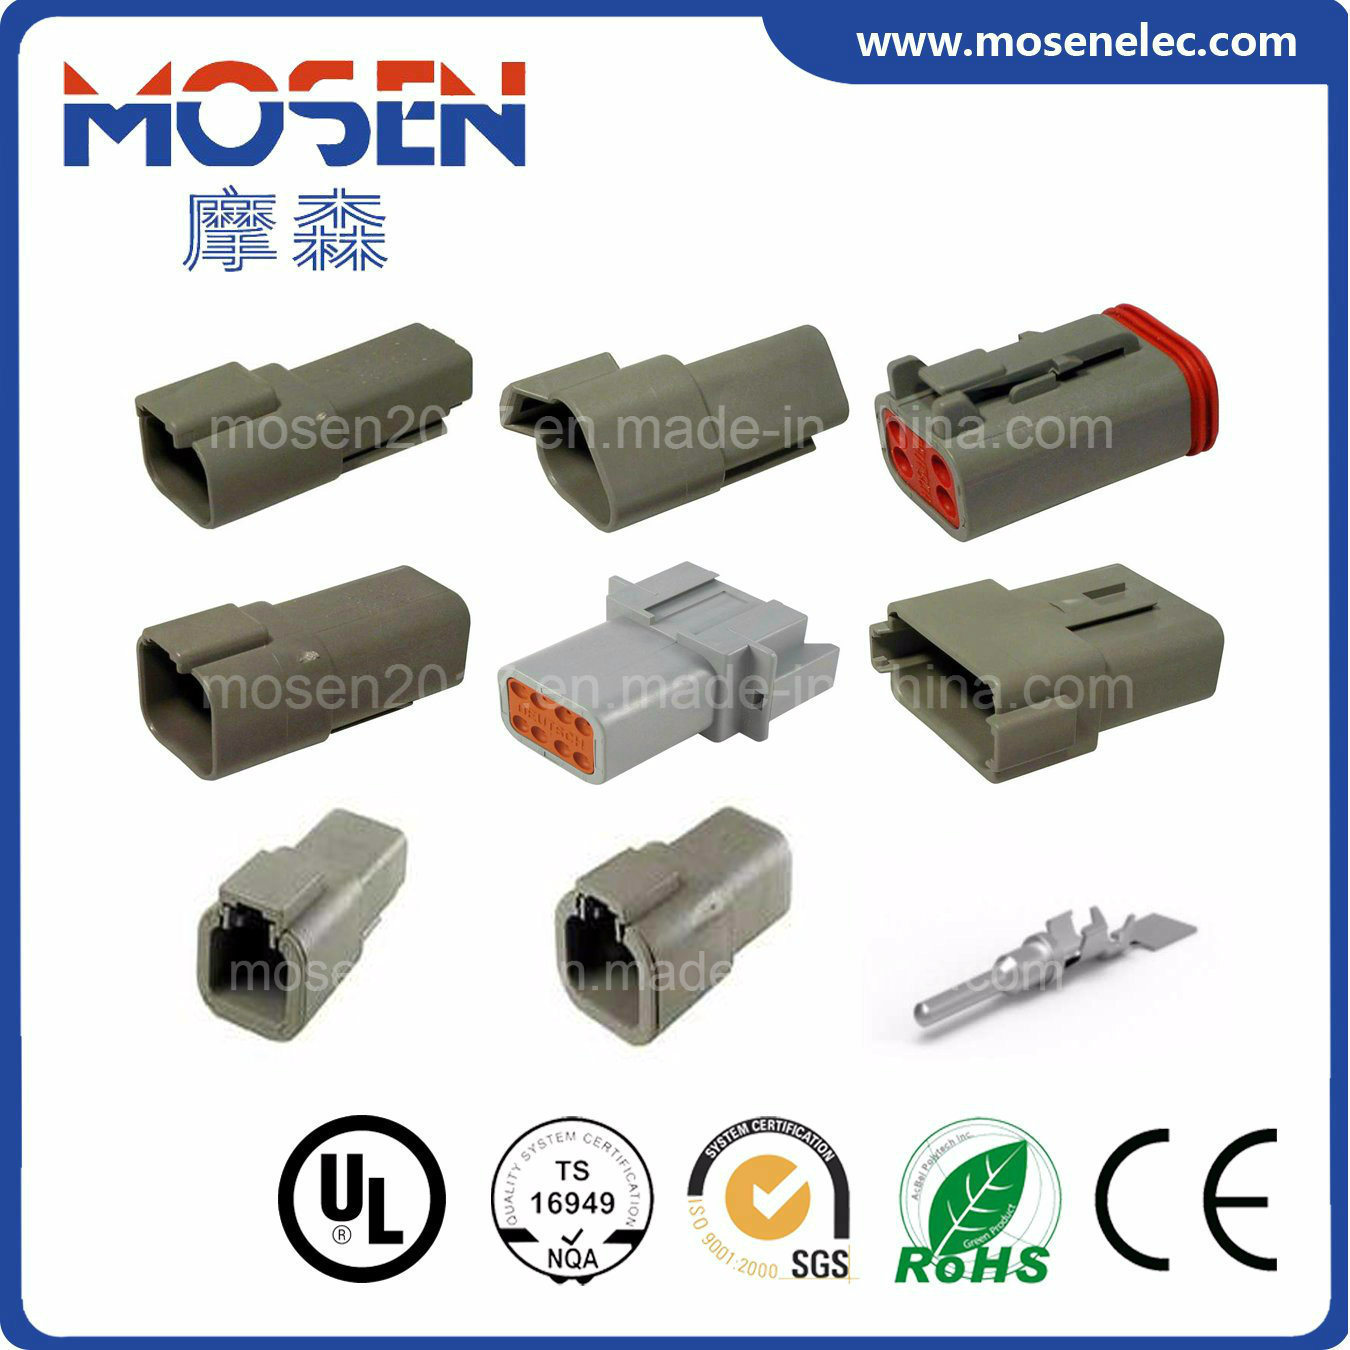 China Deutsch Auto Connector Dt04 2p 3p 4p 6p 8p Wiring Connectors 12p Dtp04 Electrical 1060 16 0122 Wire